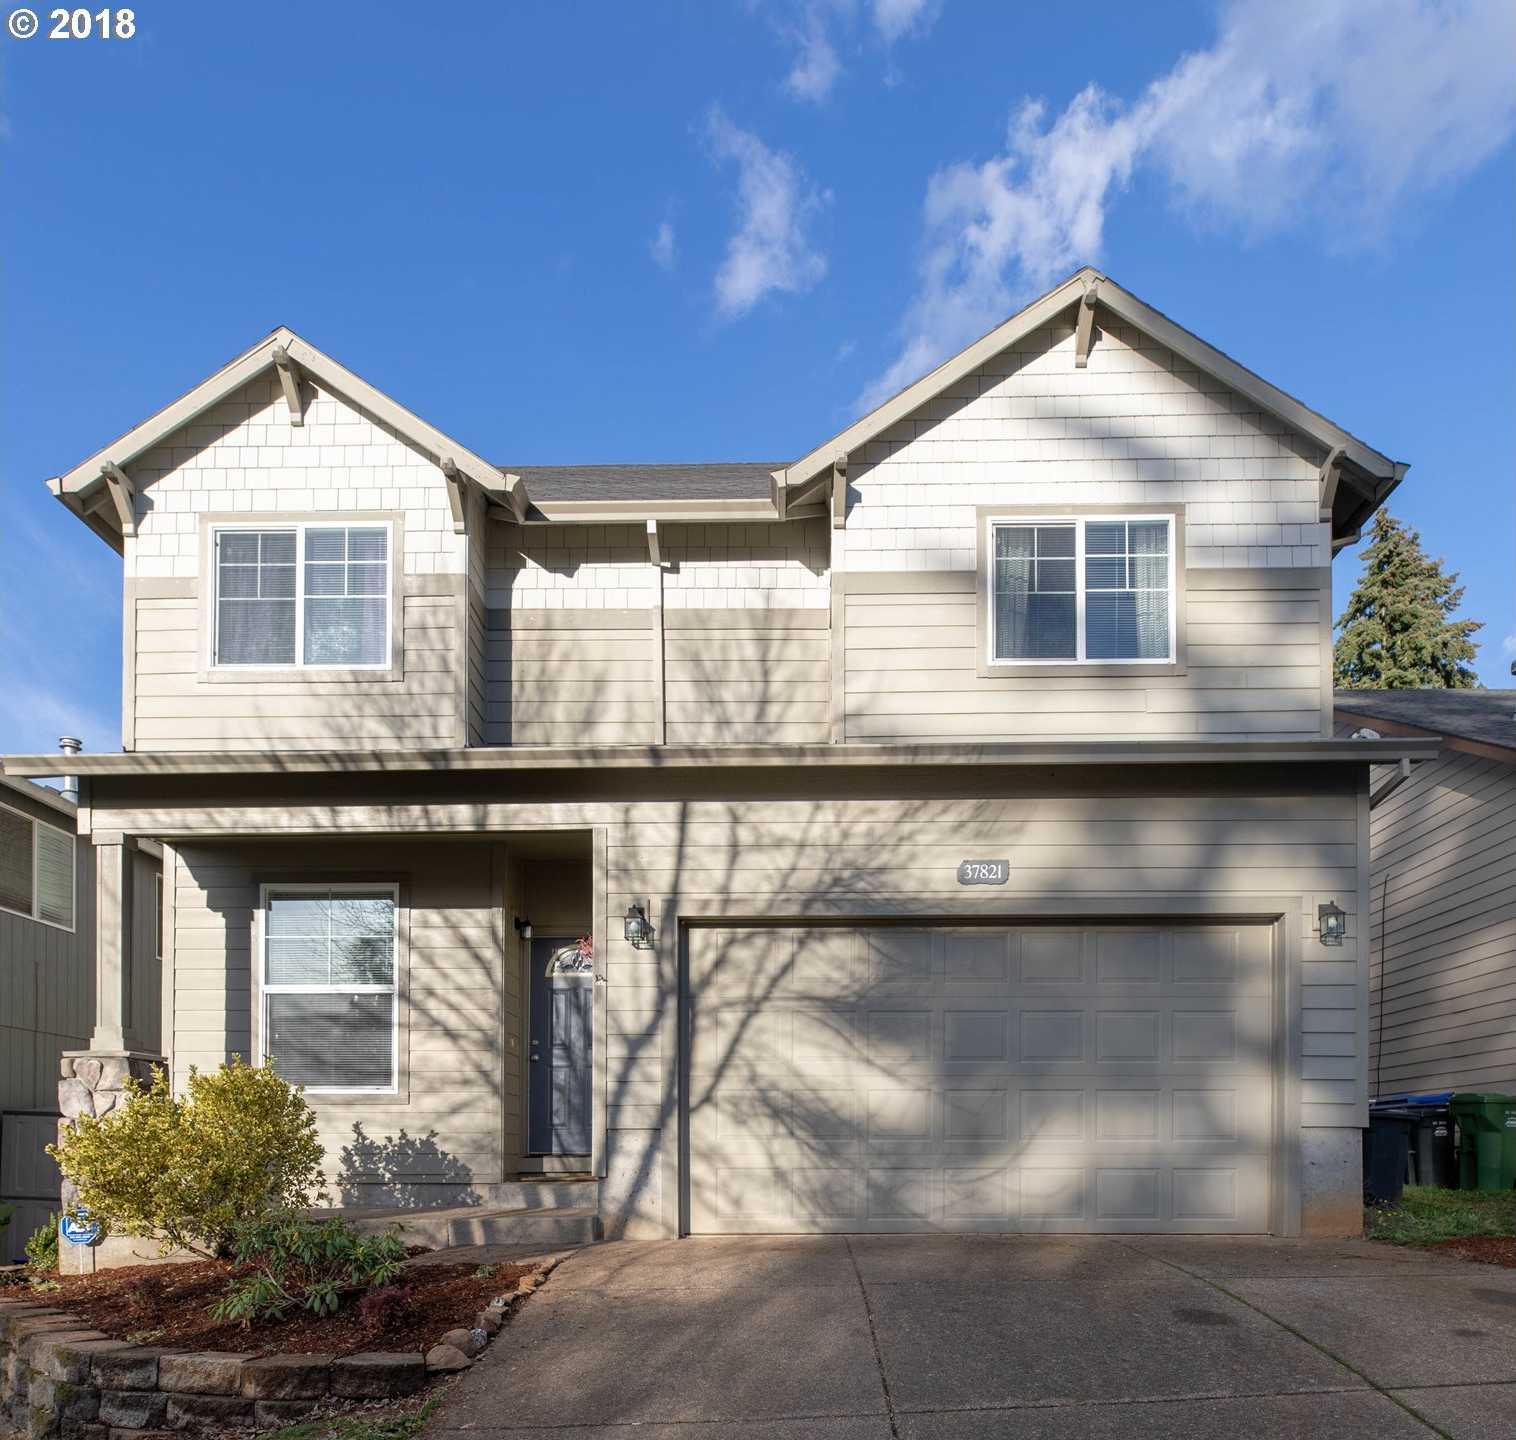 $350,000 - 4Br/3Ba -  for Sale in Hamilton Ridge, Sandy